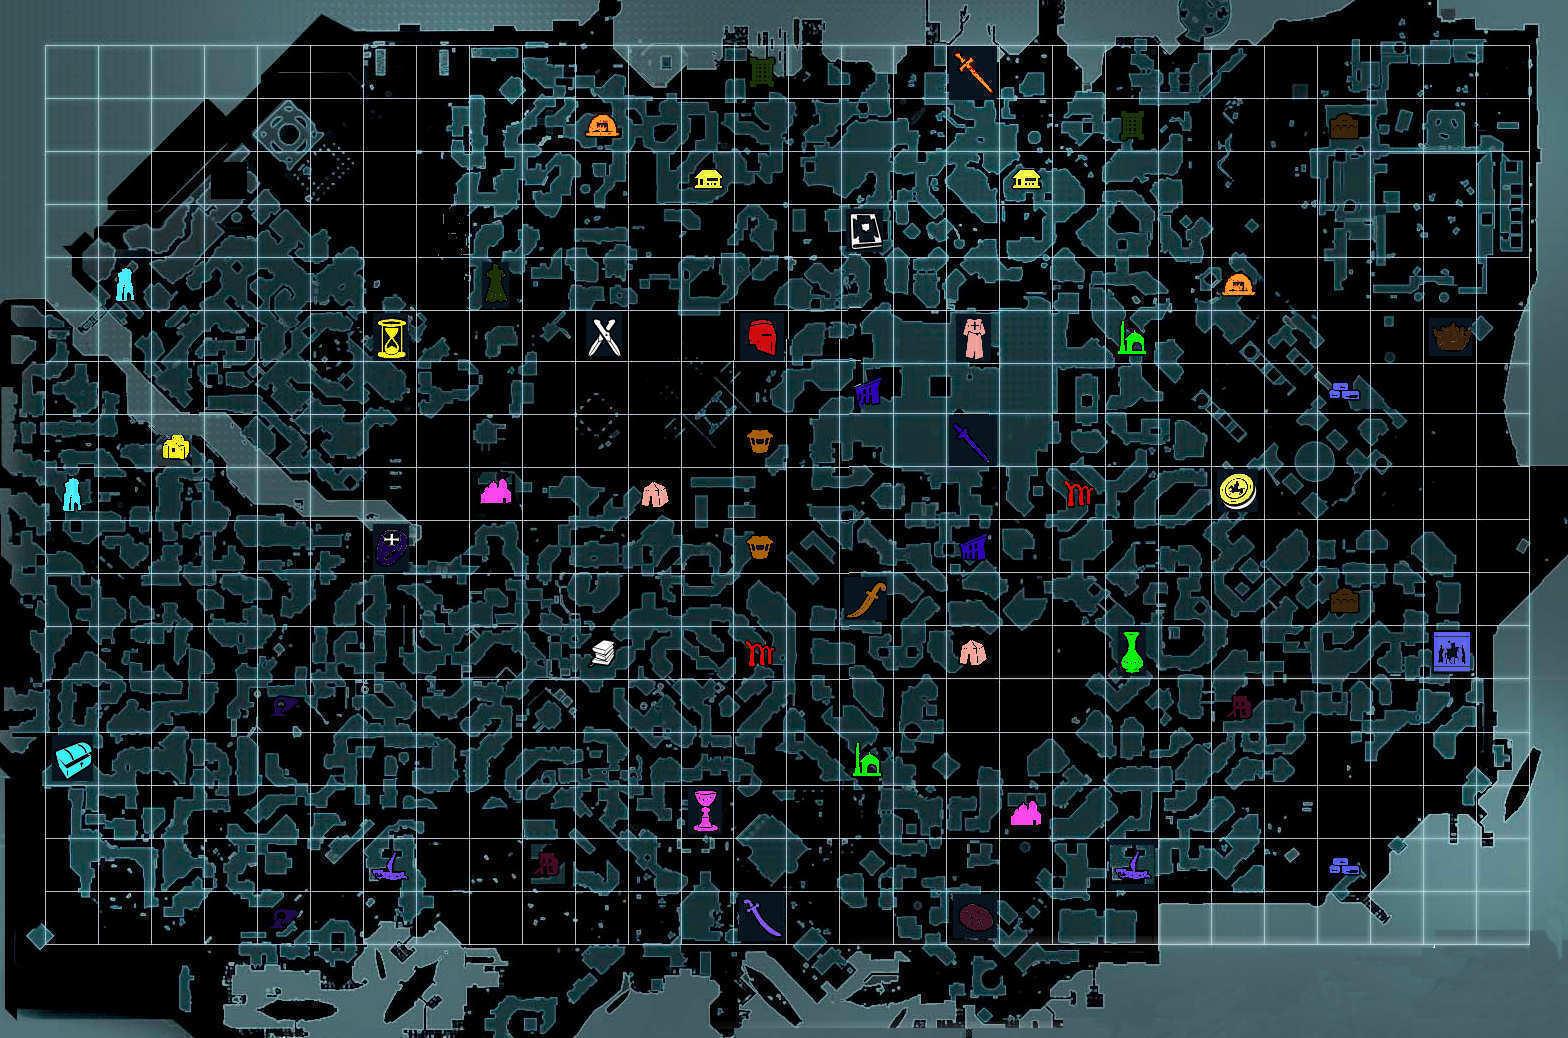 Скачать карту ассасин крид 4 для майнкрафт